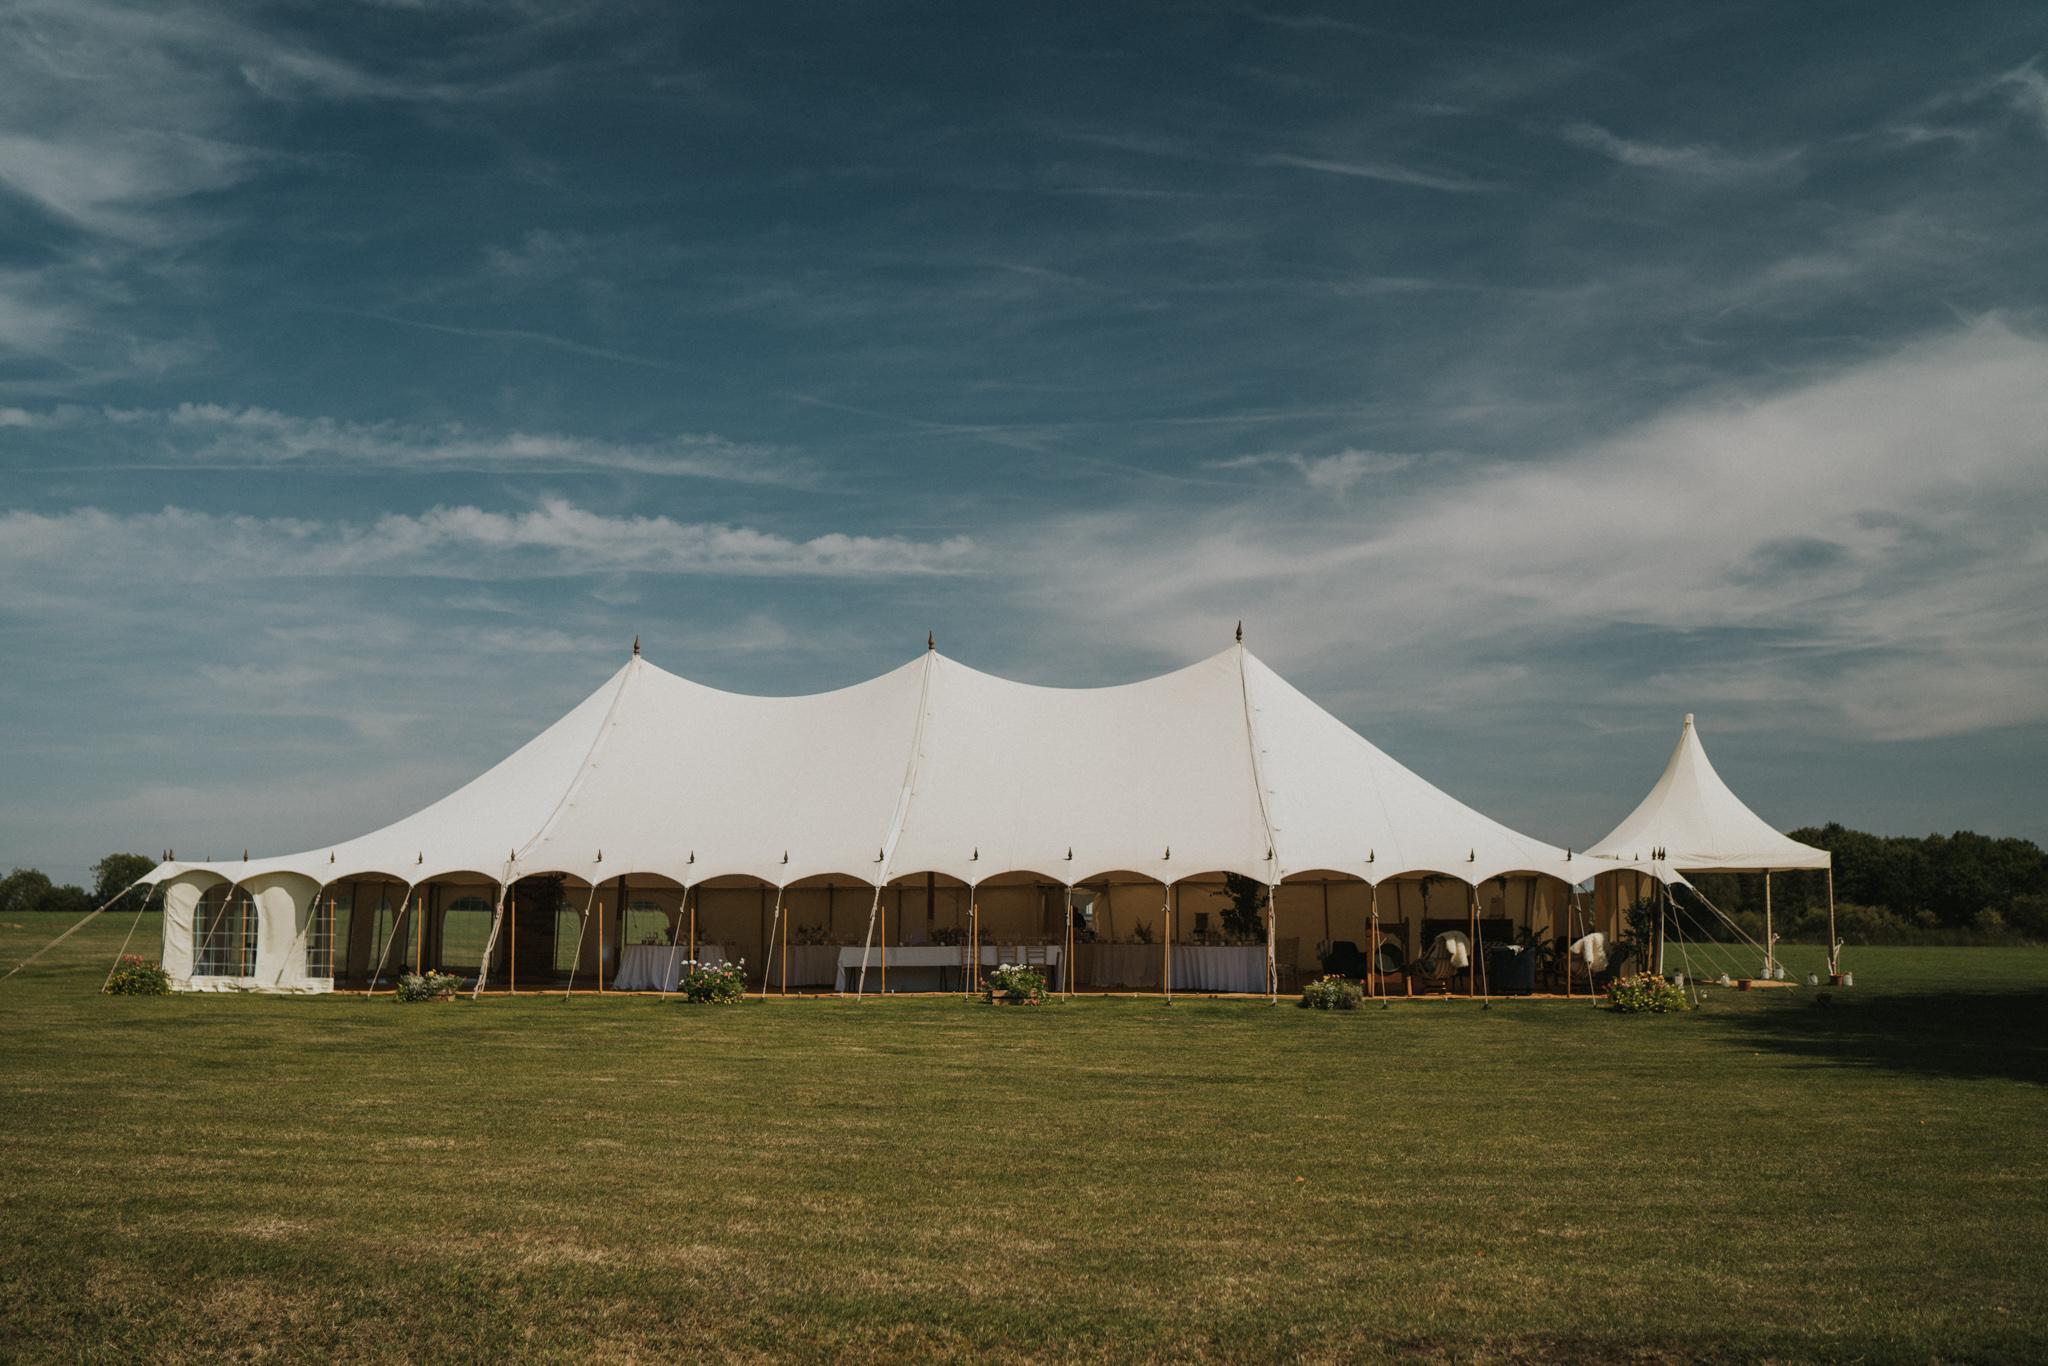 emi-Jack-boho-diy-wedding-eggington-house-grace-elizabeth-colchester-essex-alternative-wedding-photographer-suffolk-norfolk-devon (22 of 56).jpg